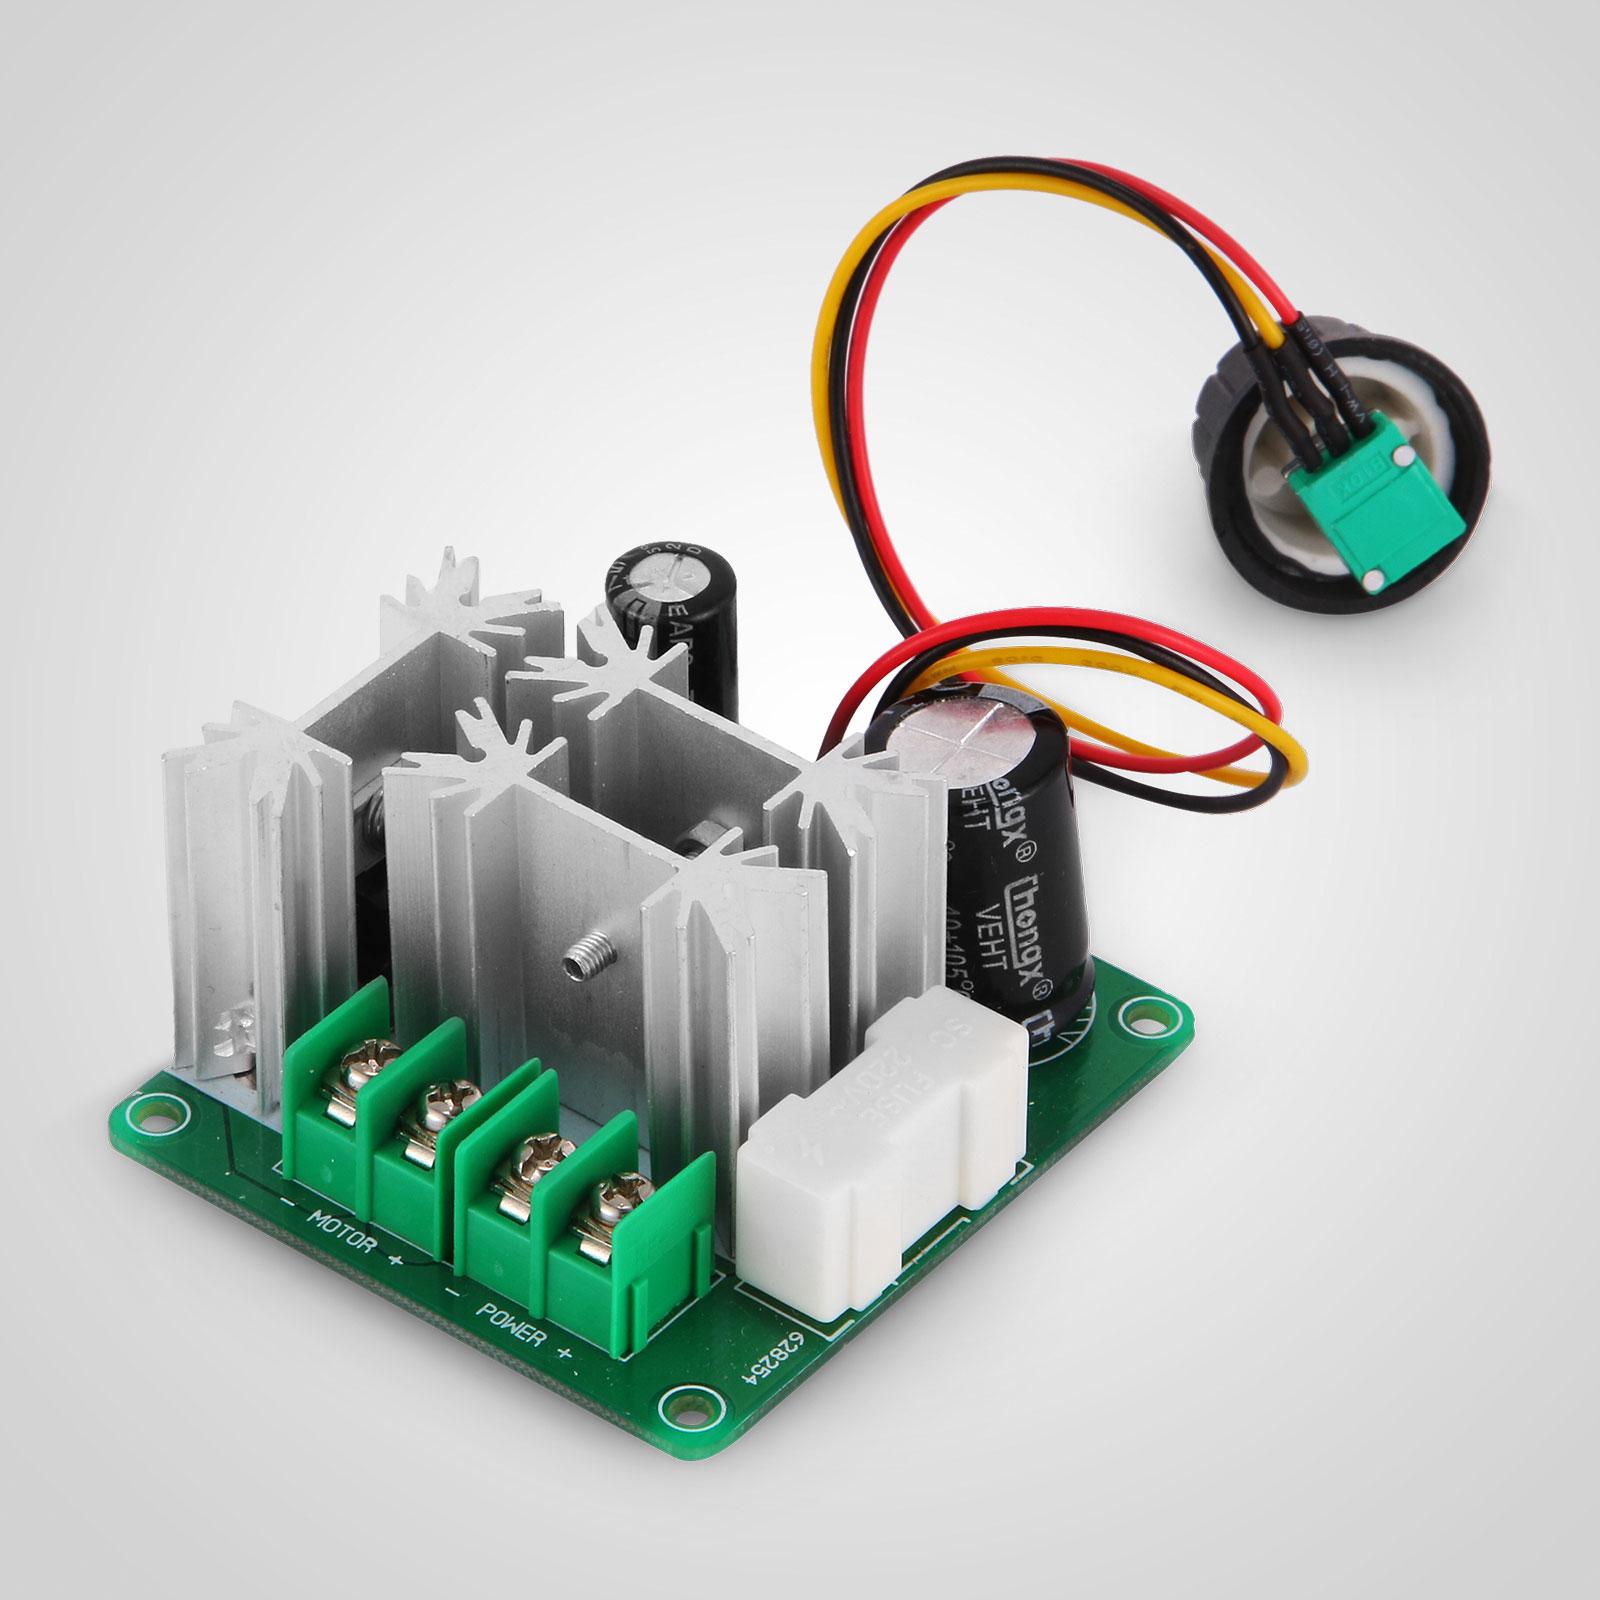 400W-Motor-del-husillo-alta-velocidad-eje-entrega-rapida-ER11-CNC-regulador